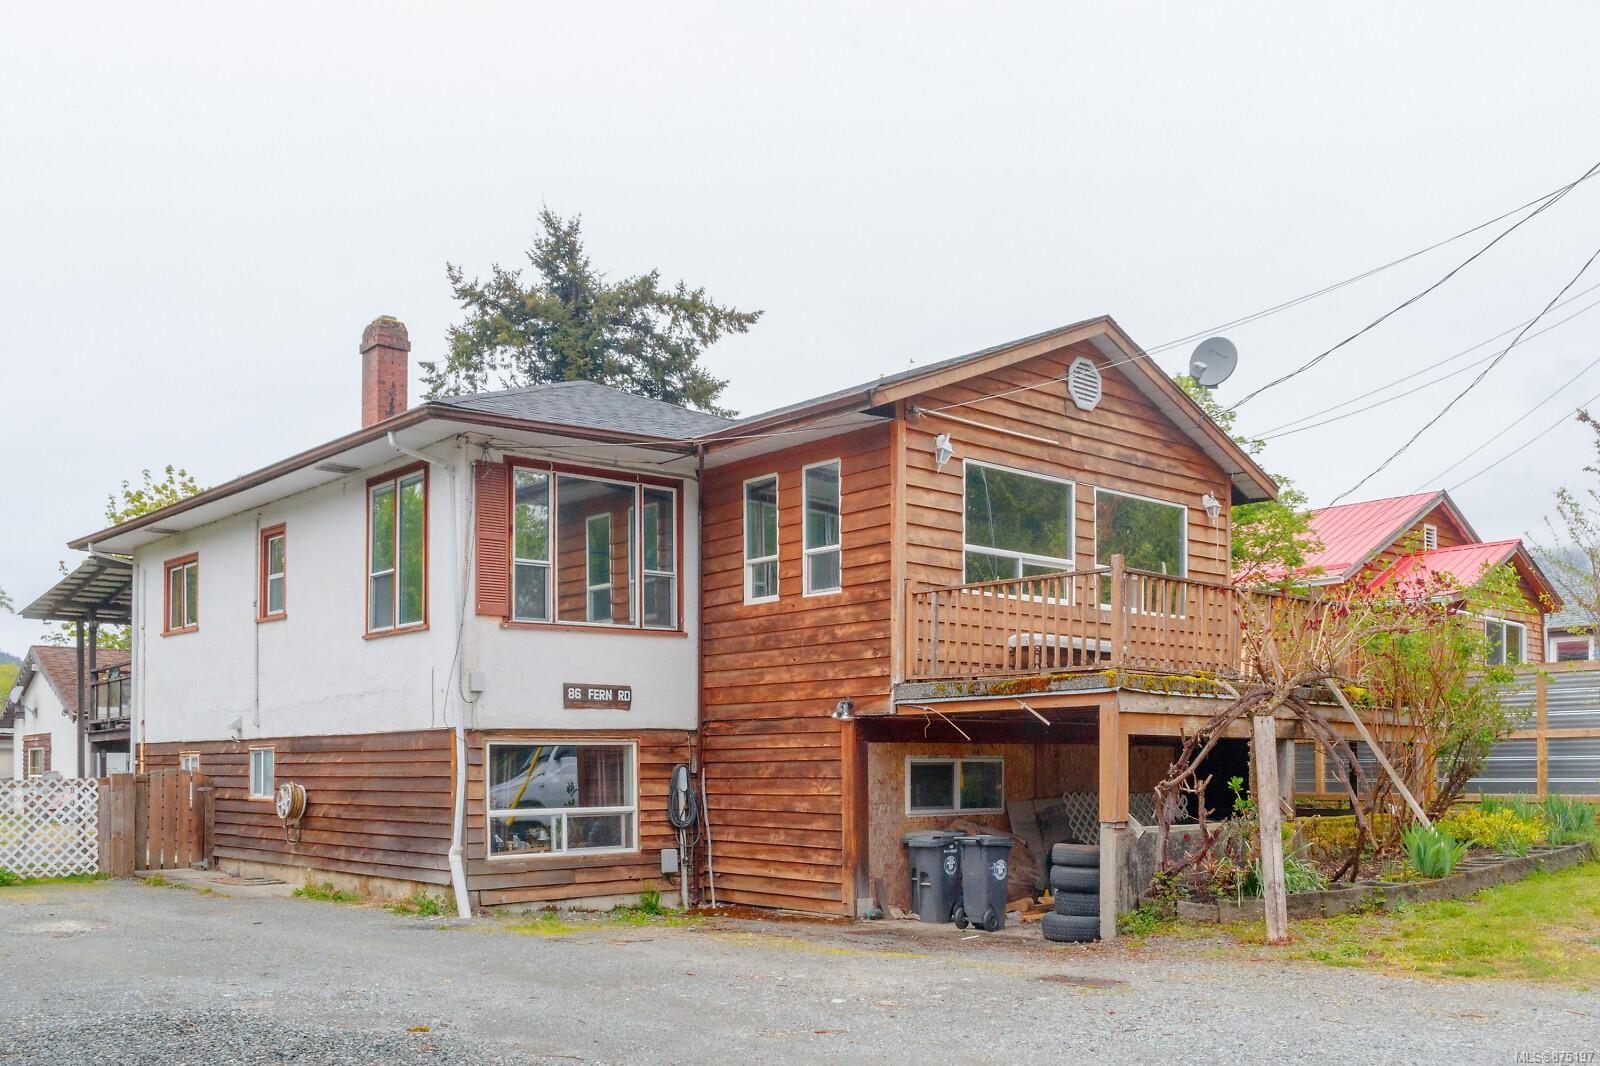 Main Photo: 86 Fern Rd in : Du Lake Cowichan House for sale (Duncan)  : MLS®# 875197